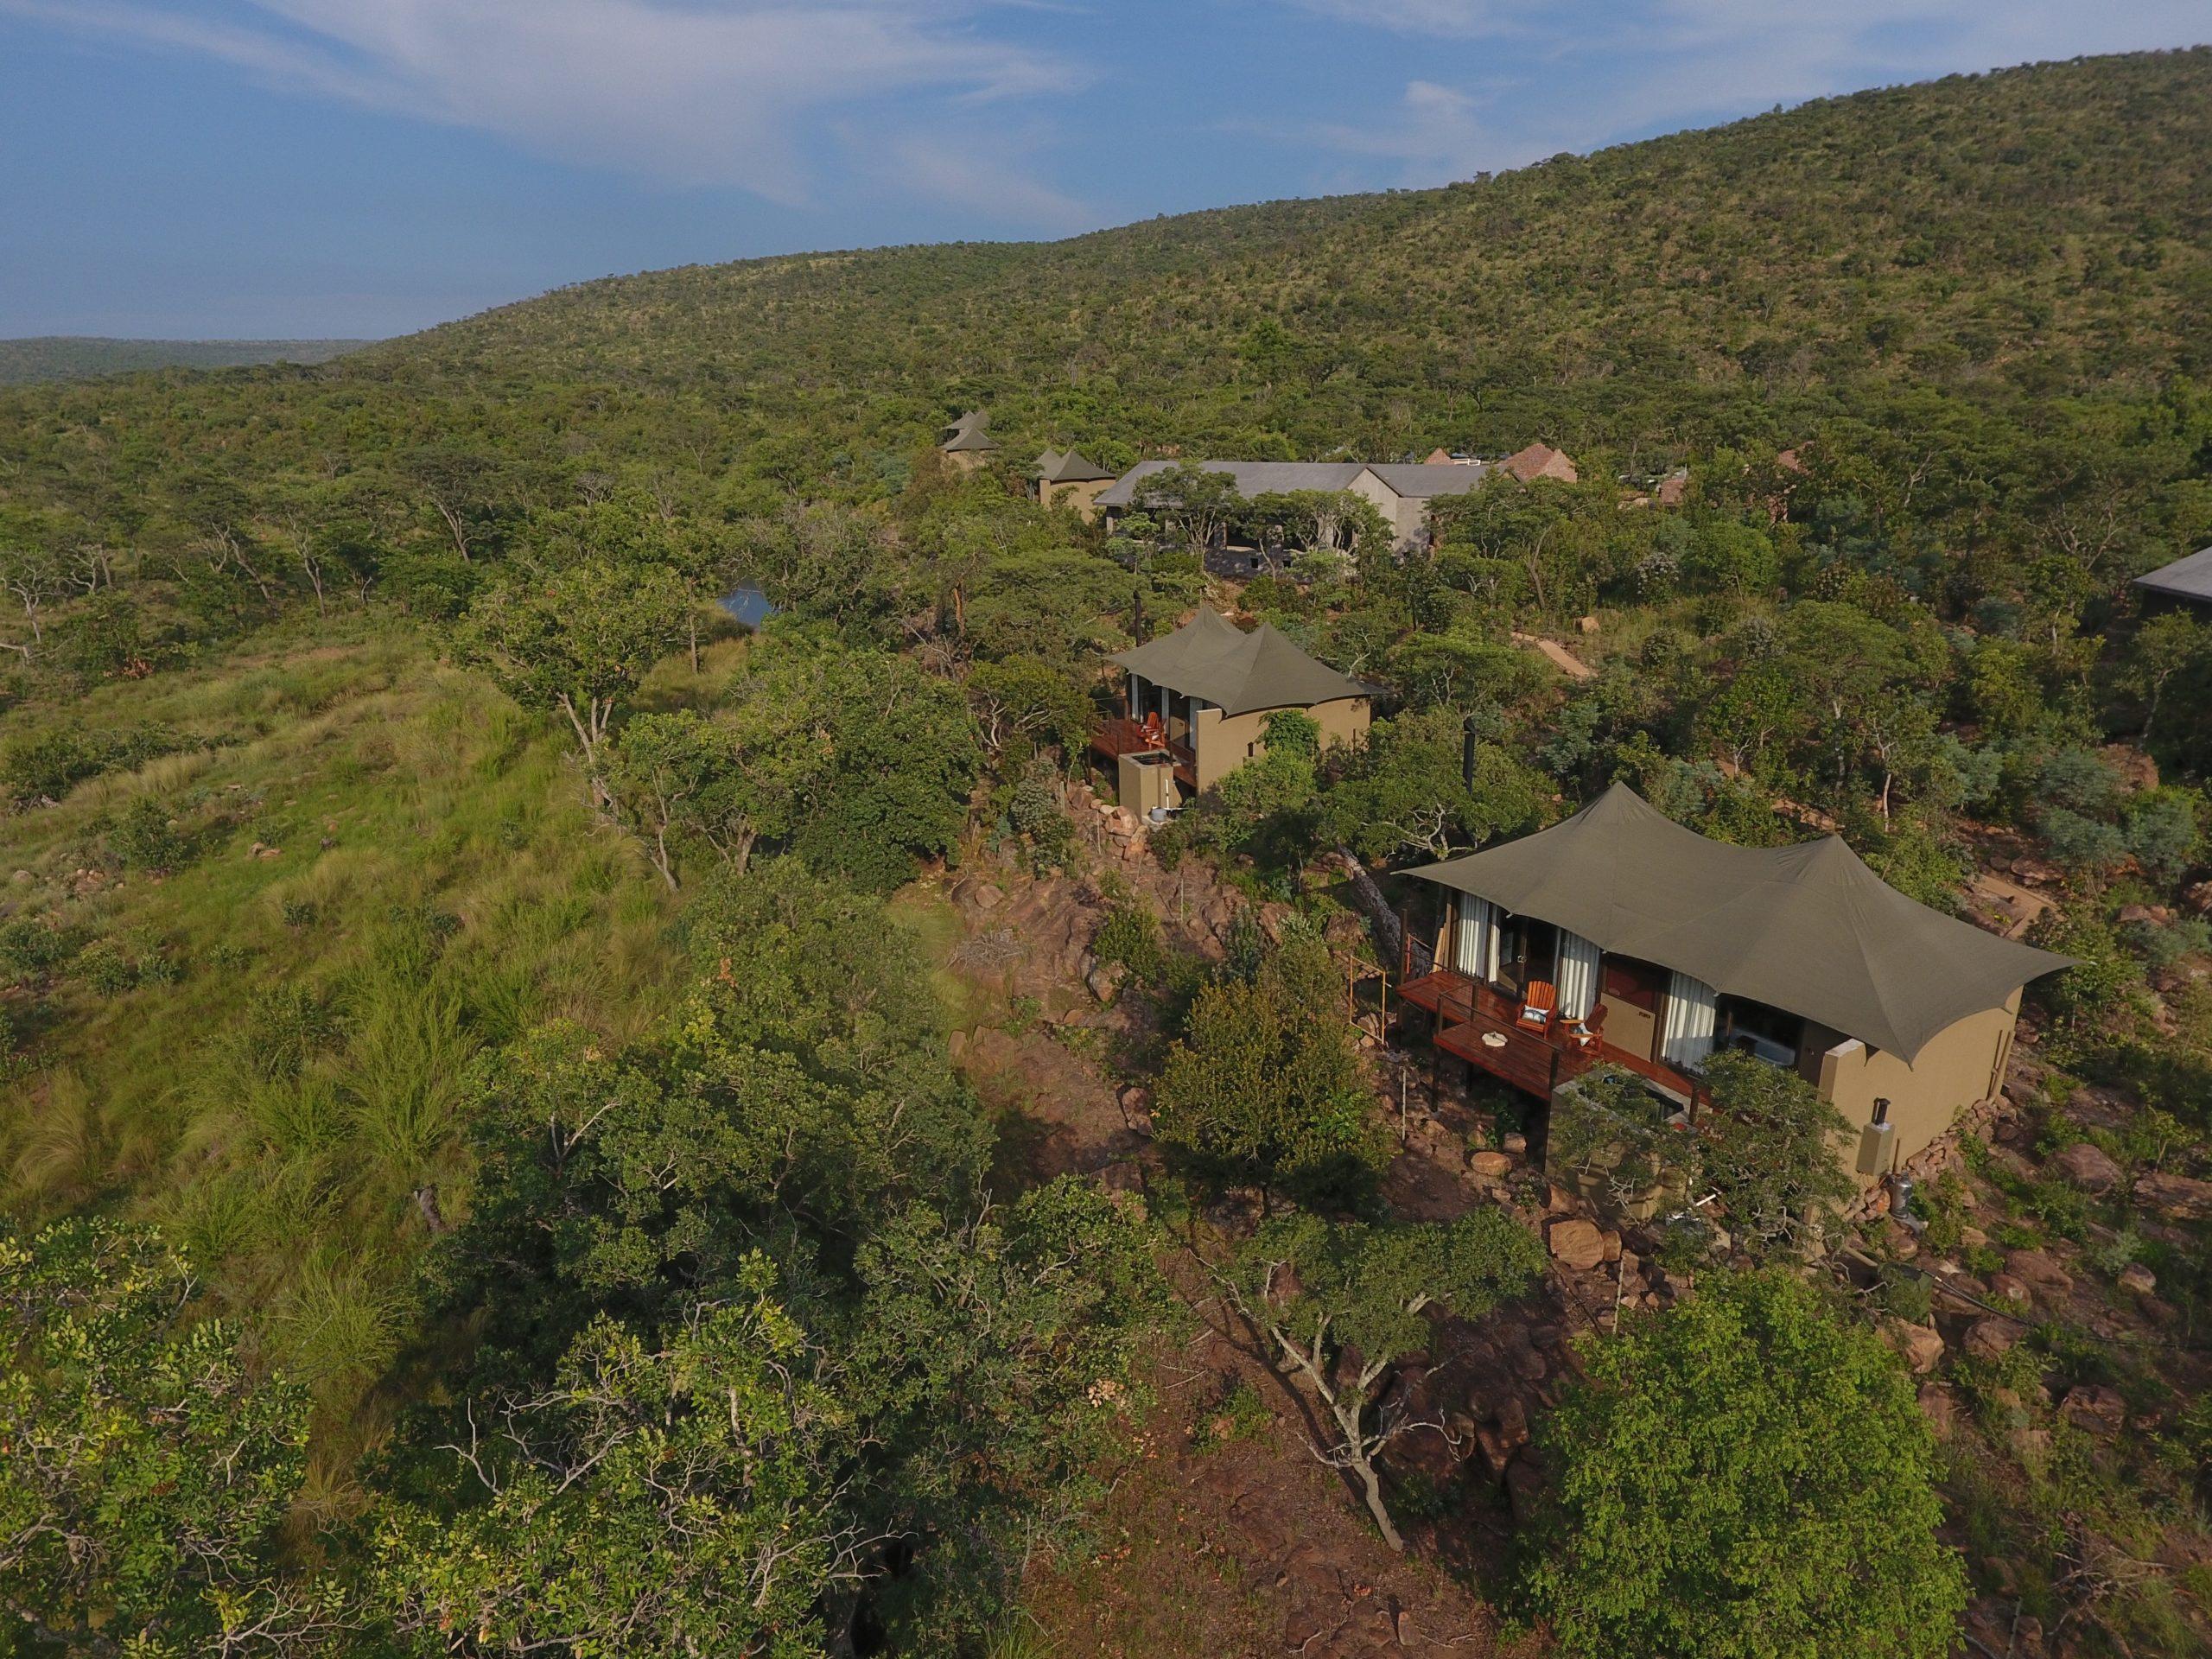 Inzalo Safari Lodge Ariel View